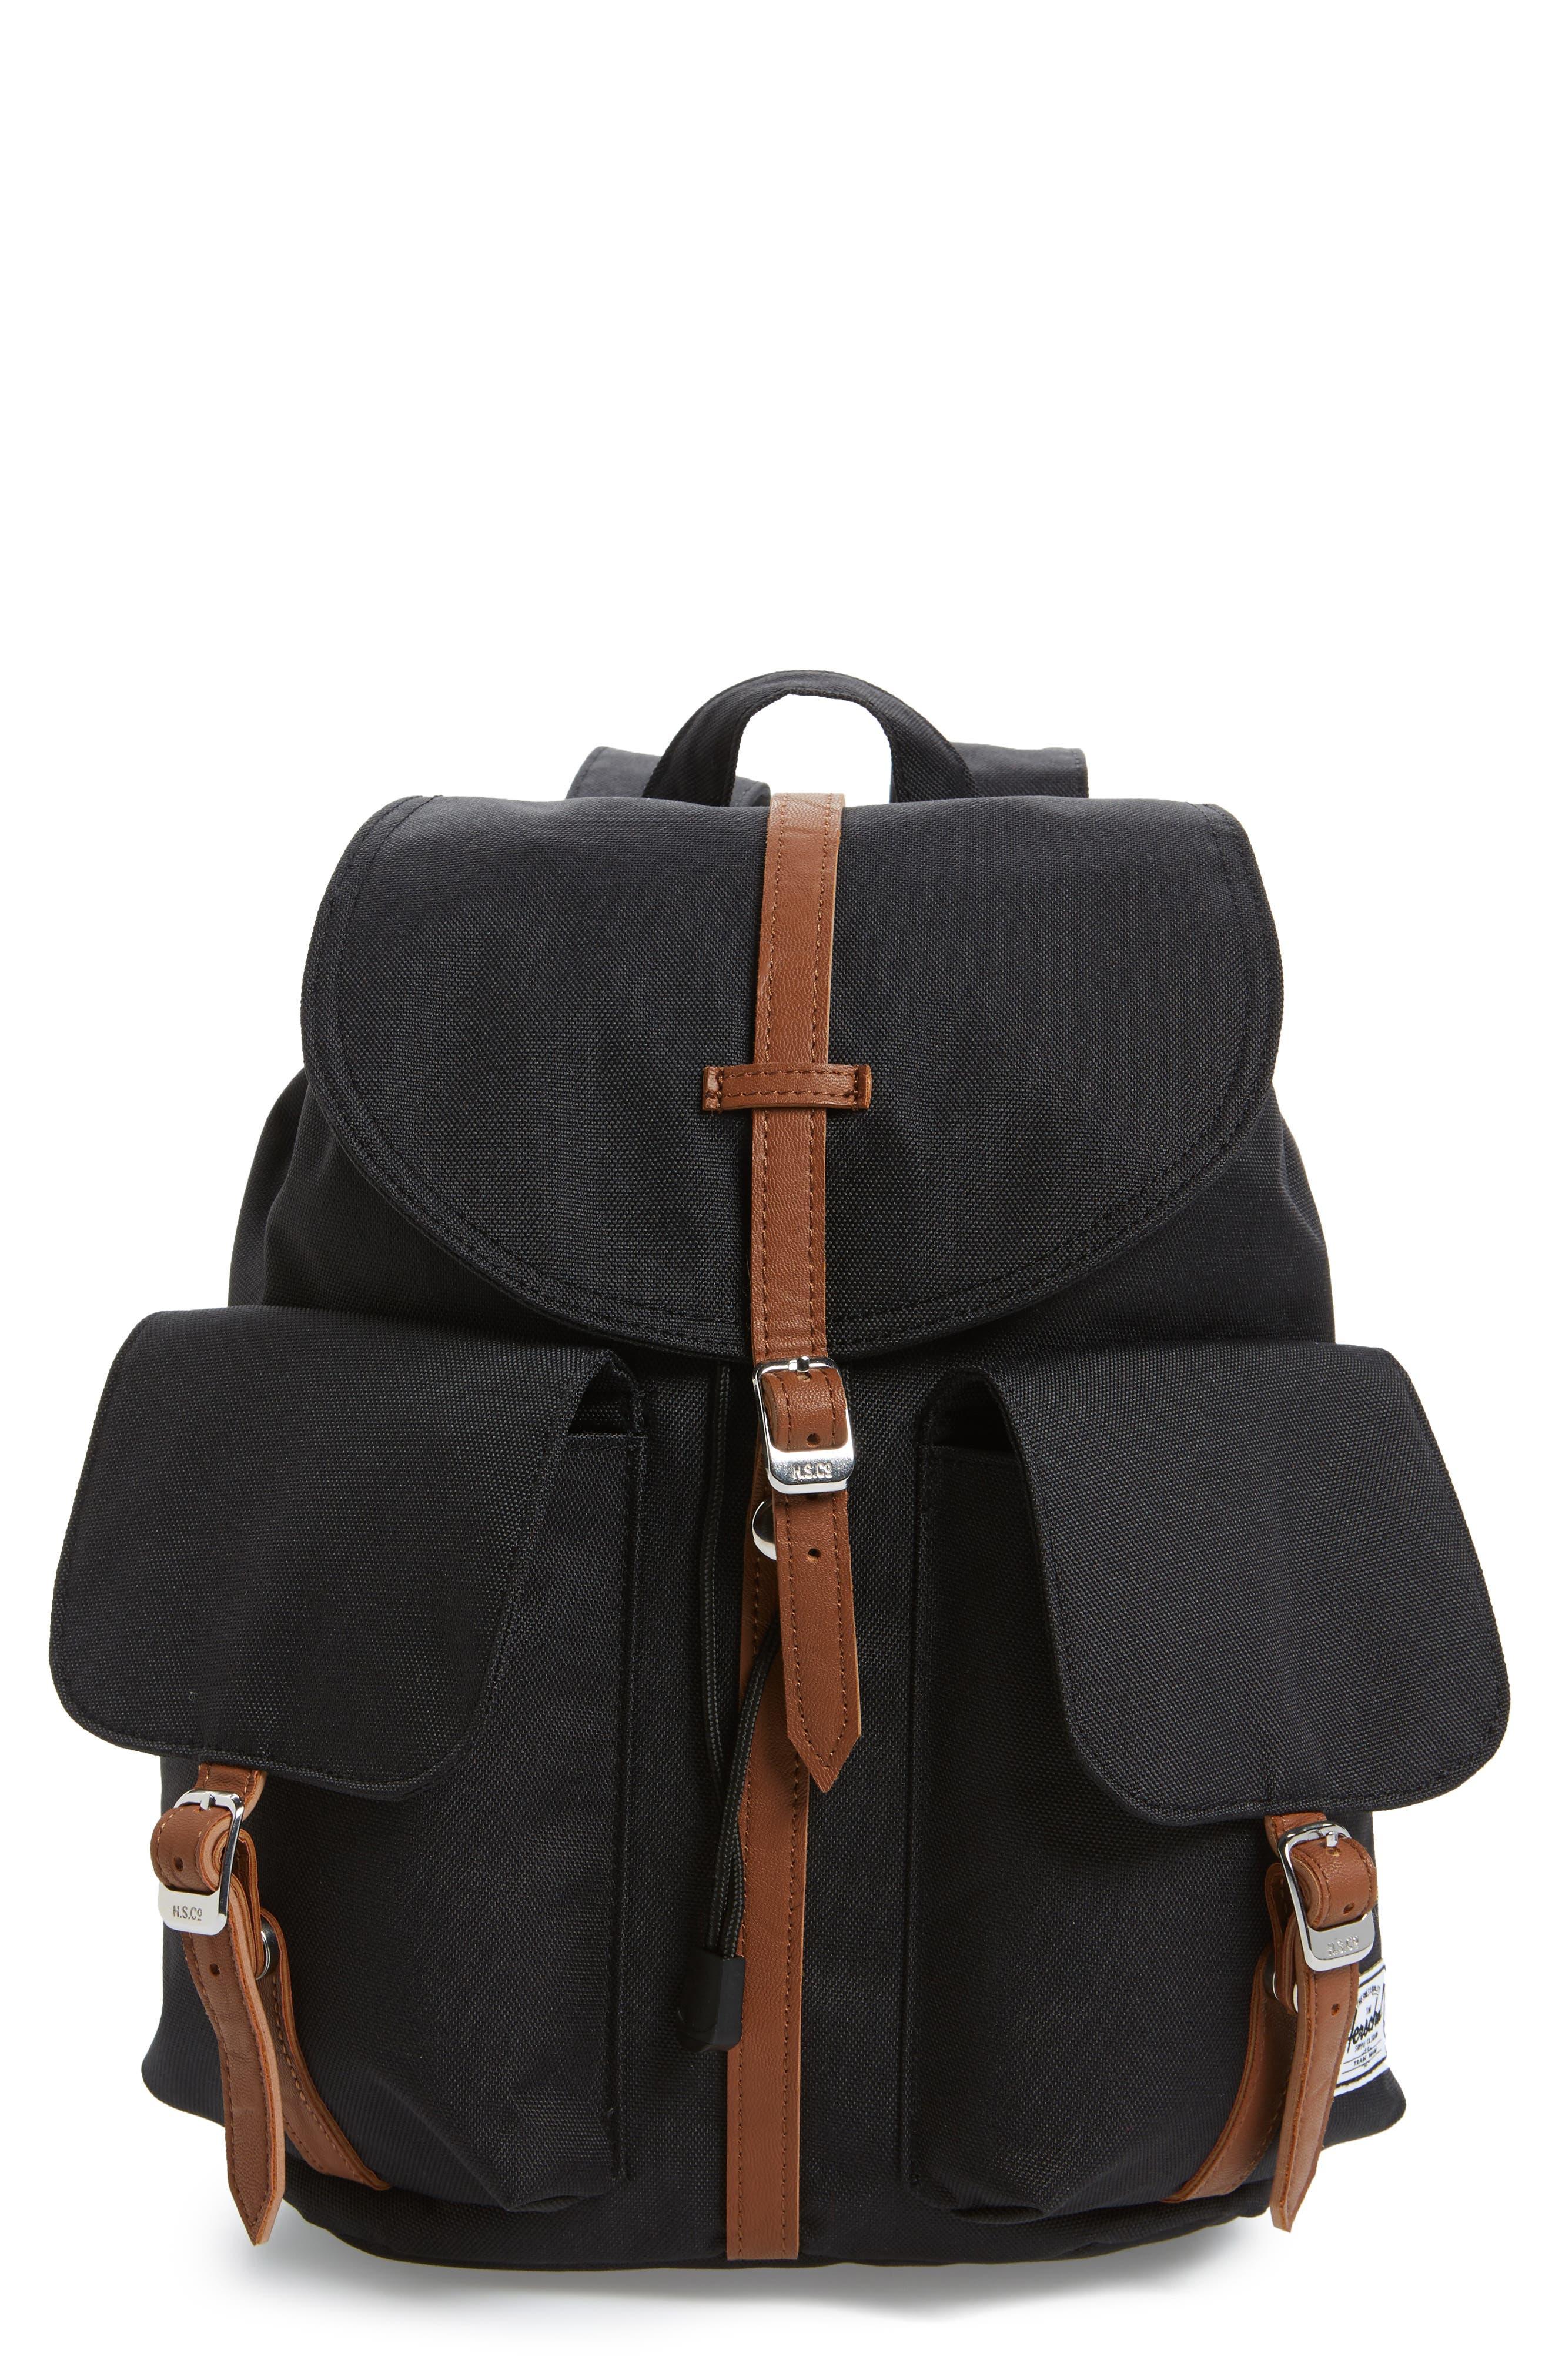 HERSCHEL SUPPLY CO X-Small Dawson Backpack - Black